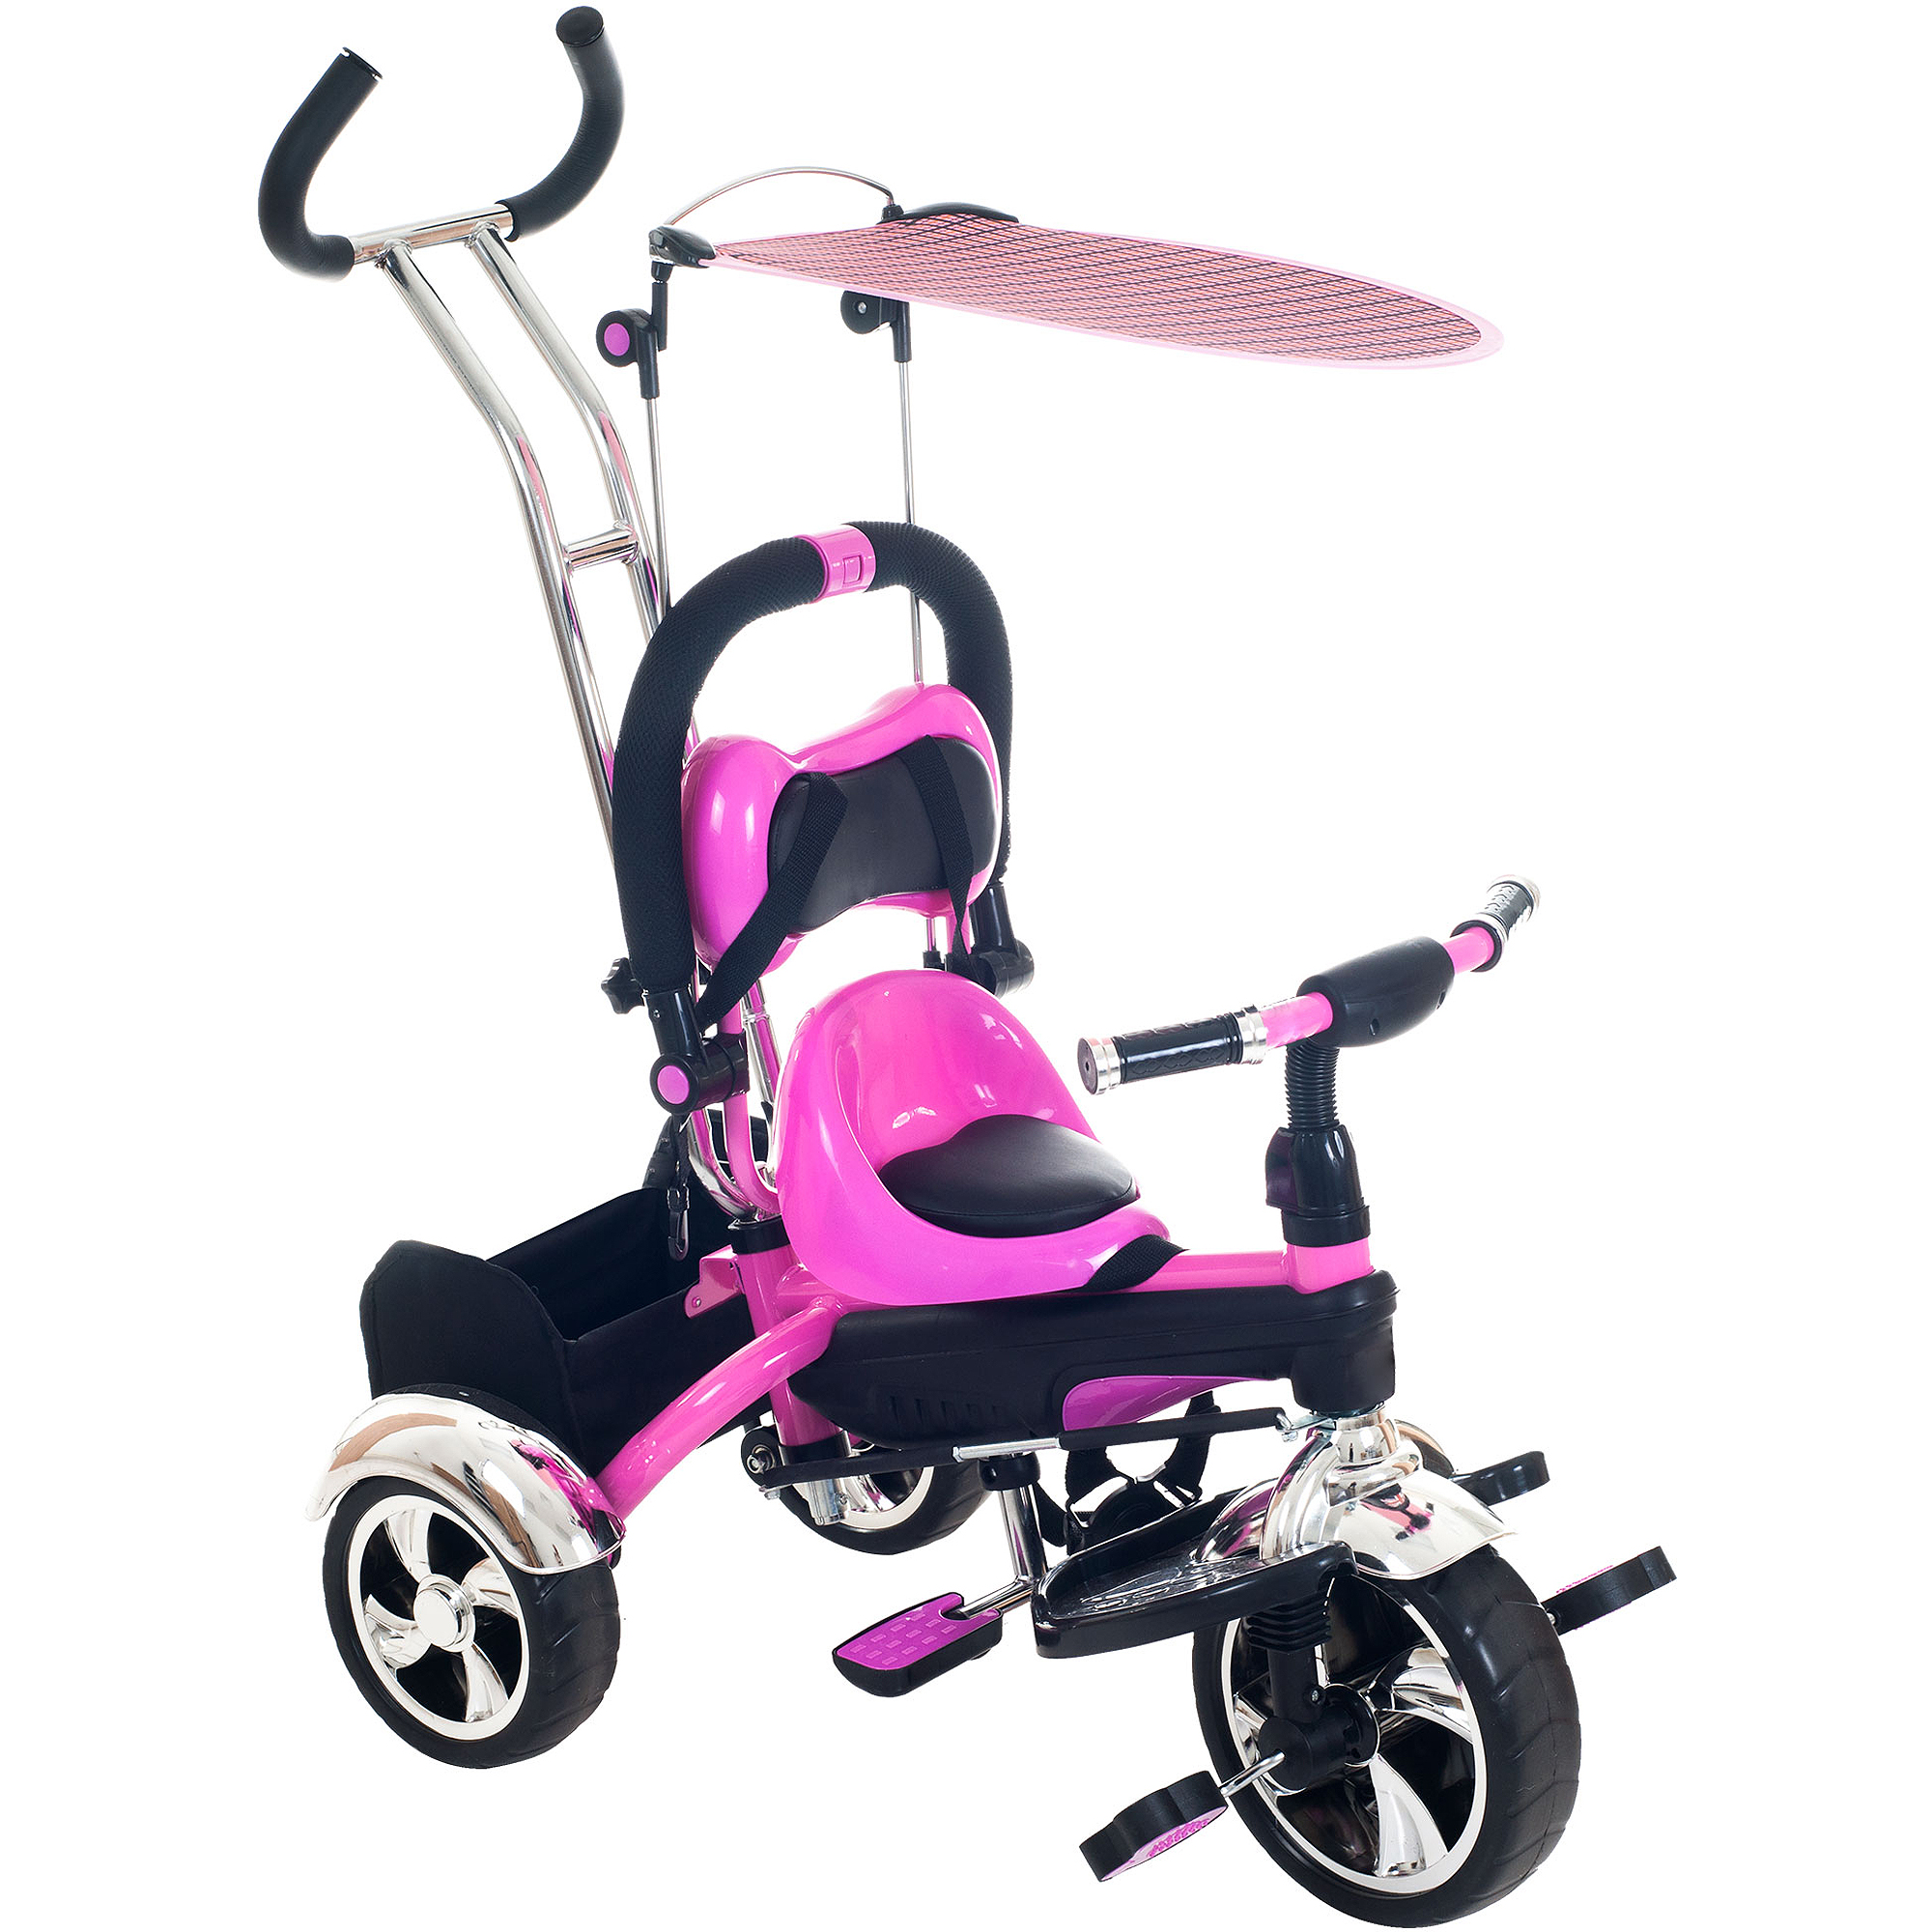 Toddler Stroller Bike Strollers 2017